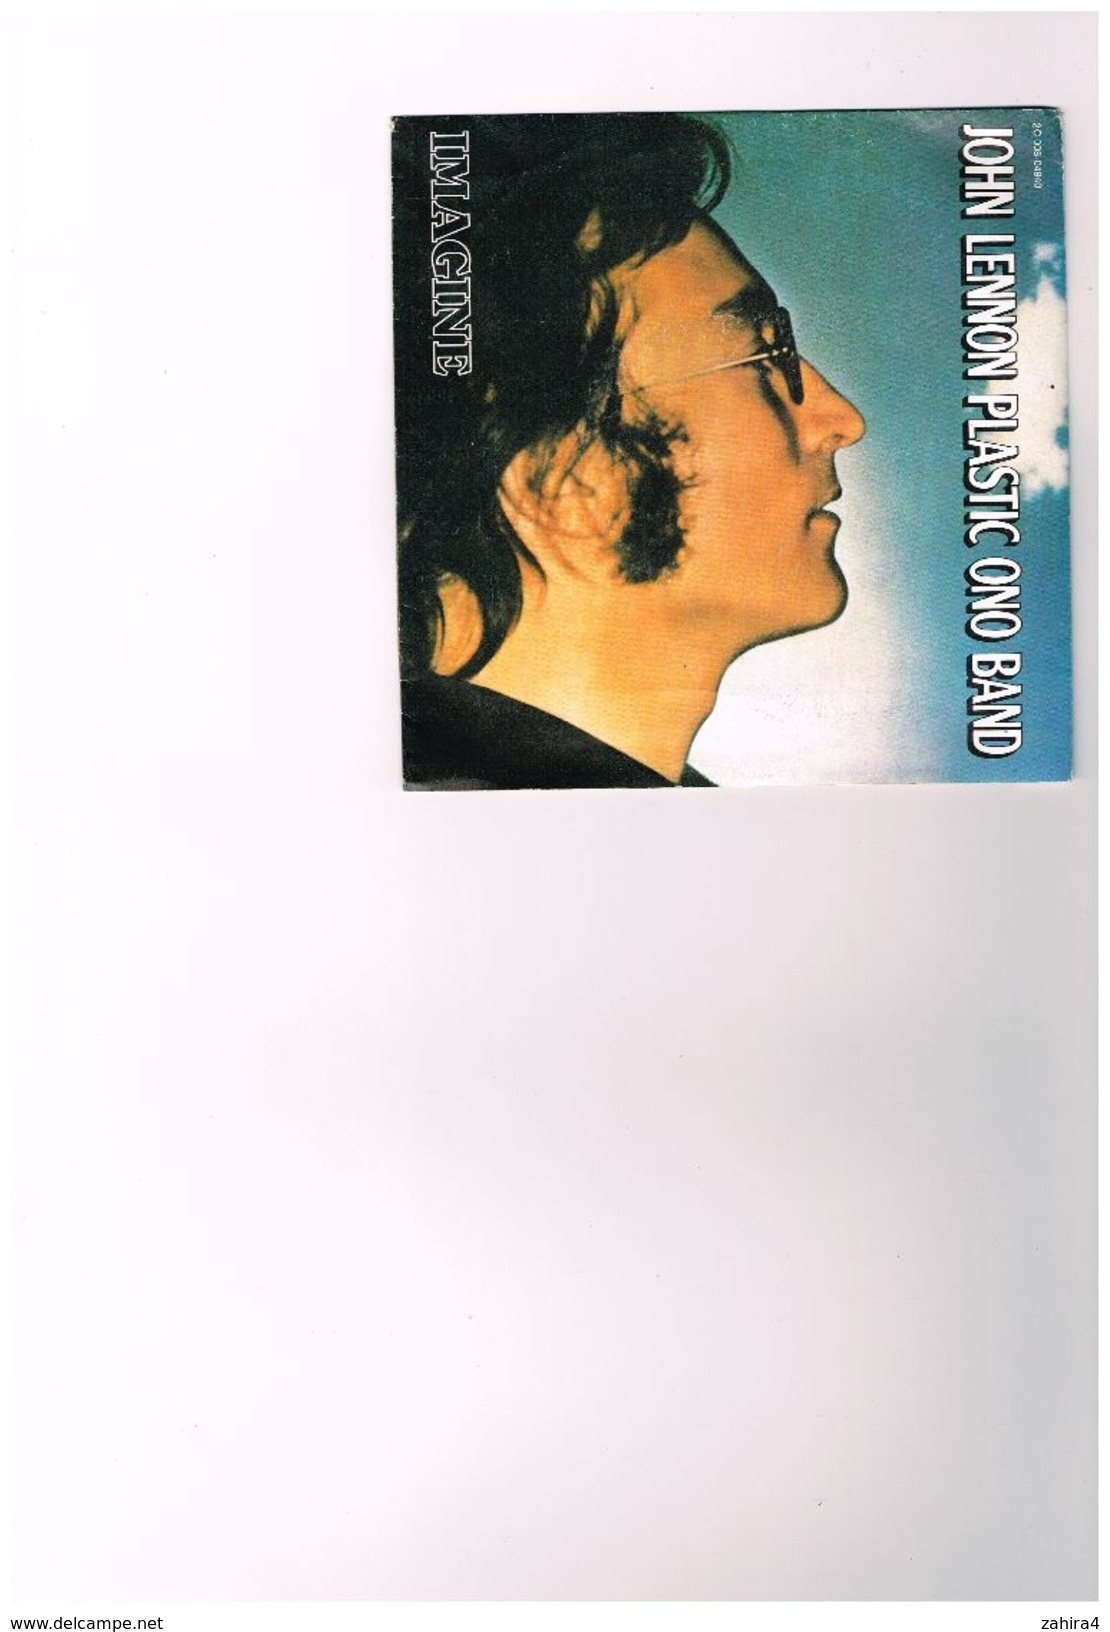 John Lennon Plastic Ono Band  Imagine  It's So Hard - 2C 008 04940  PM 100 - Disco, Pop